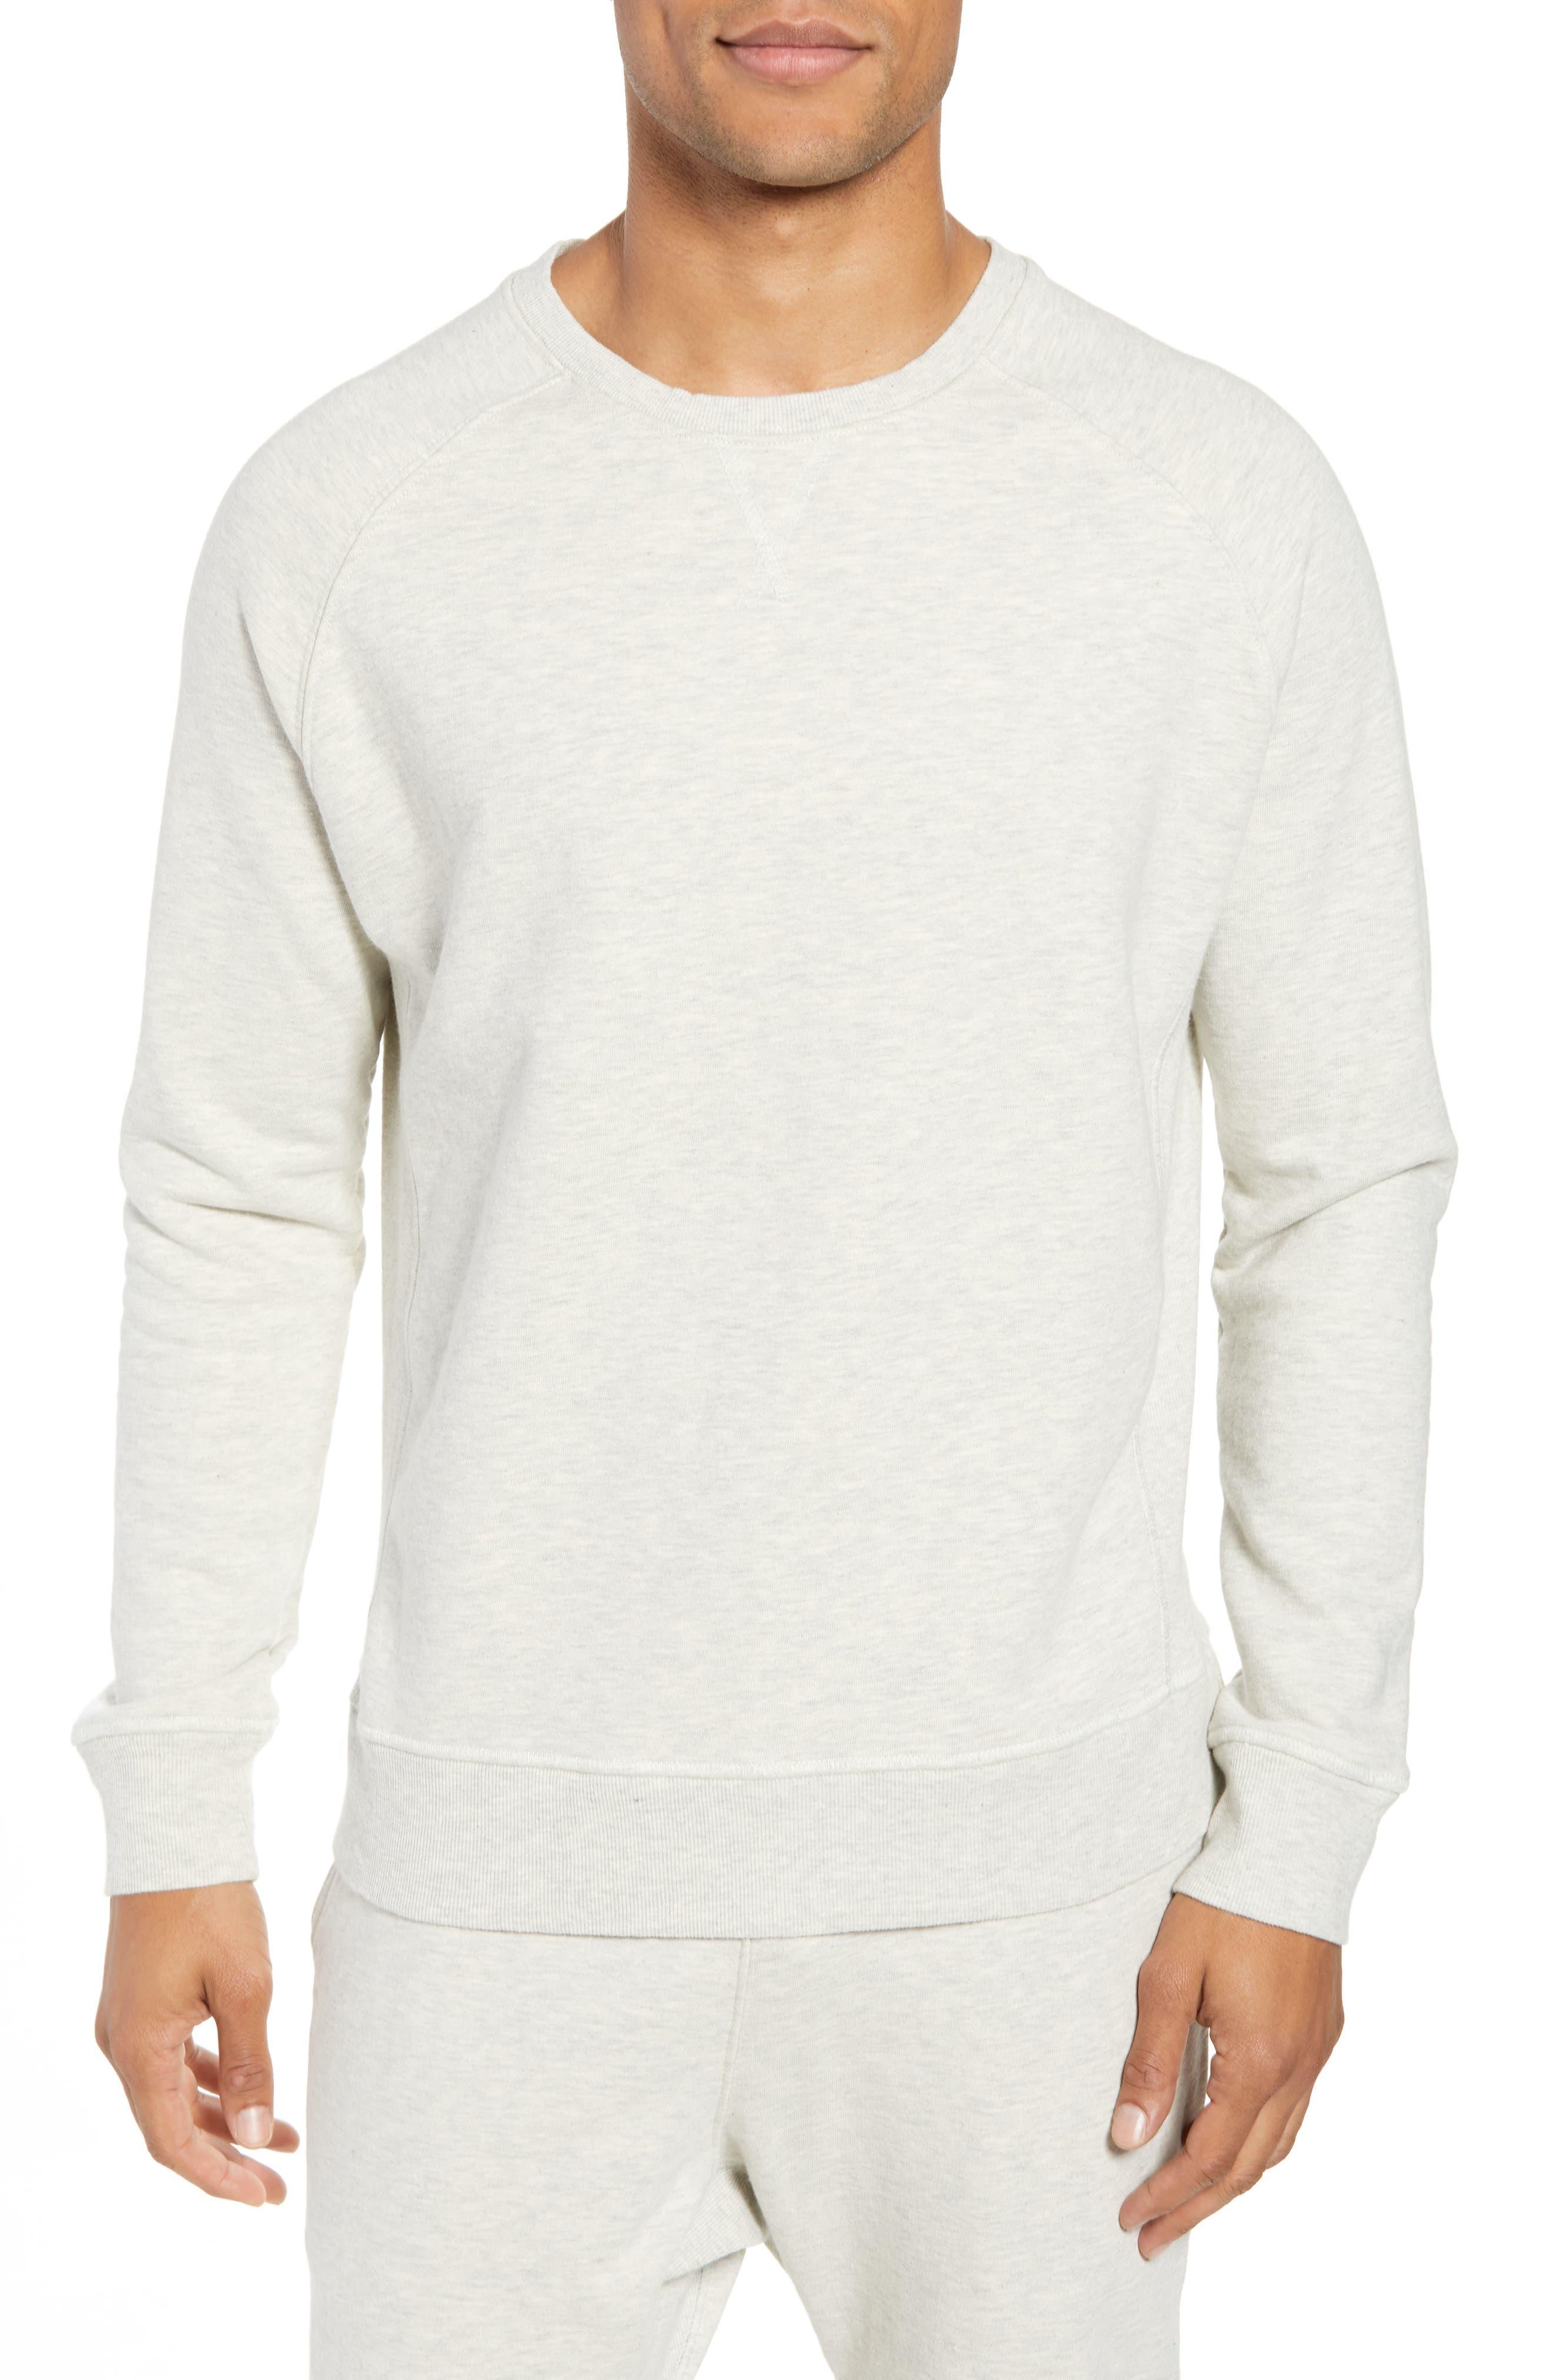 RICHER POORER Crewneck Cotton Sweatshirt in Oatmeal